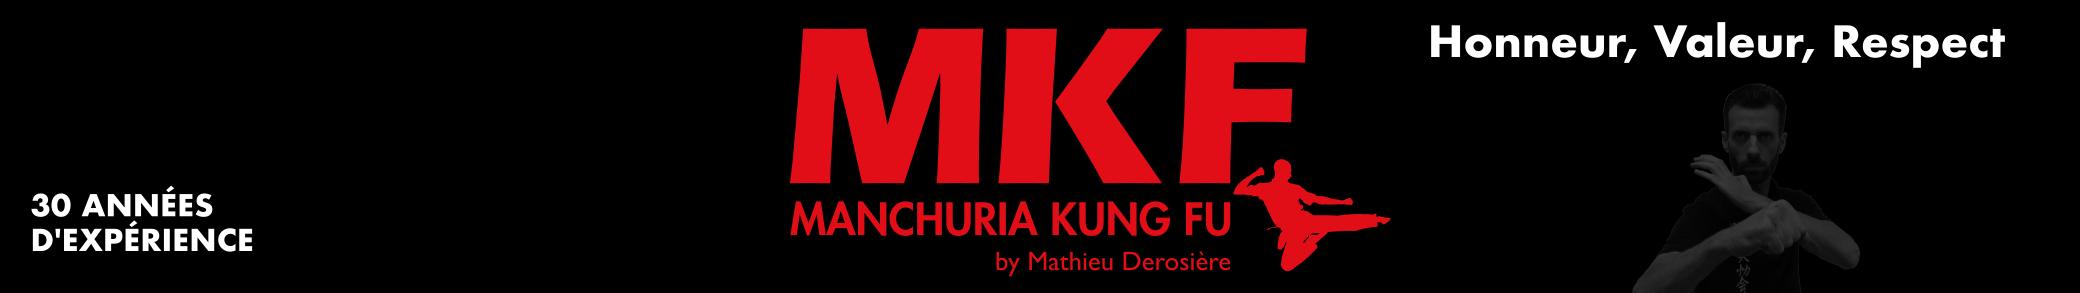 Manchuria Kung Fu